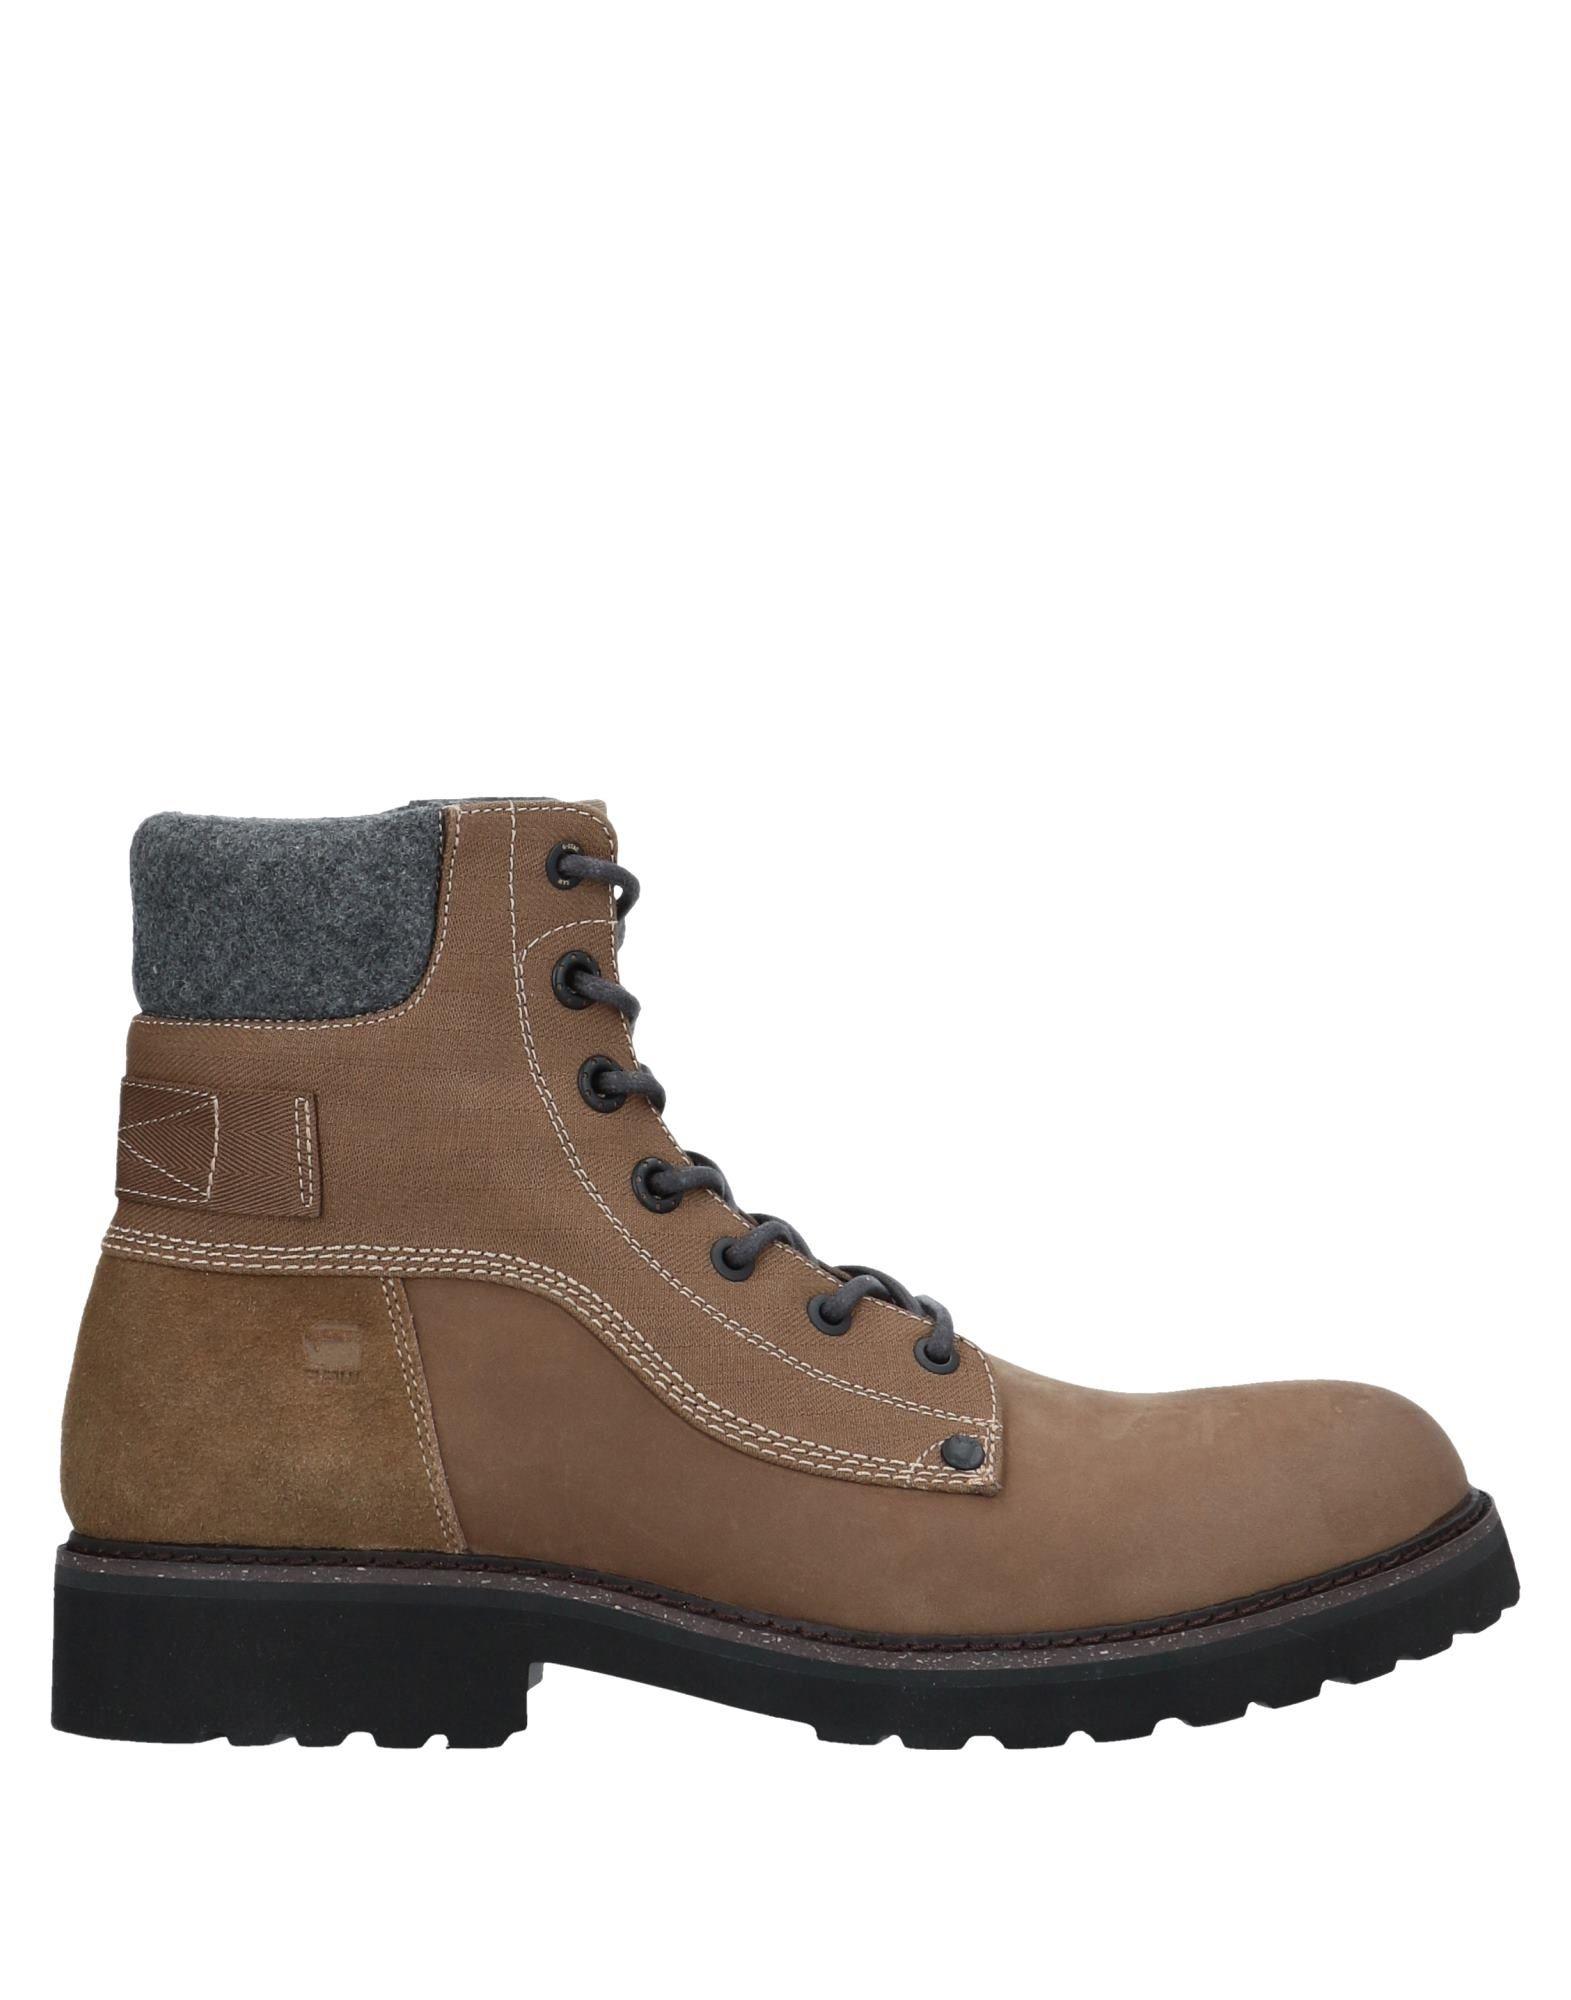 Rabatt Rabatt Rabatt echte Schuhe G 11537800UX 9aebd4